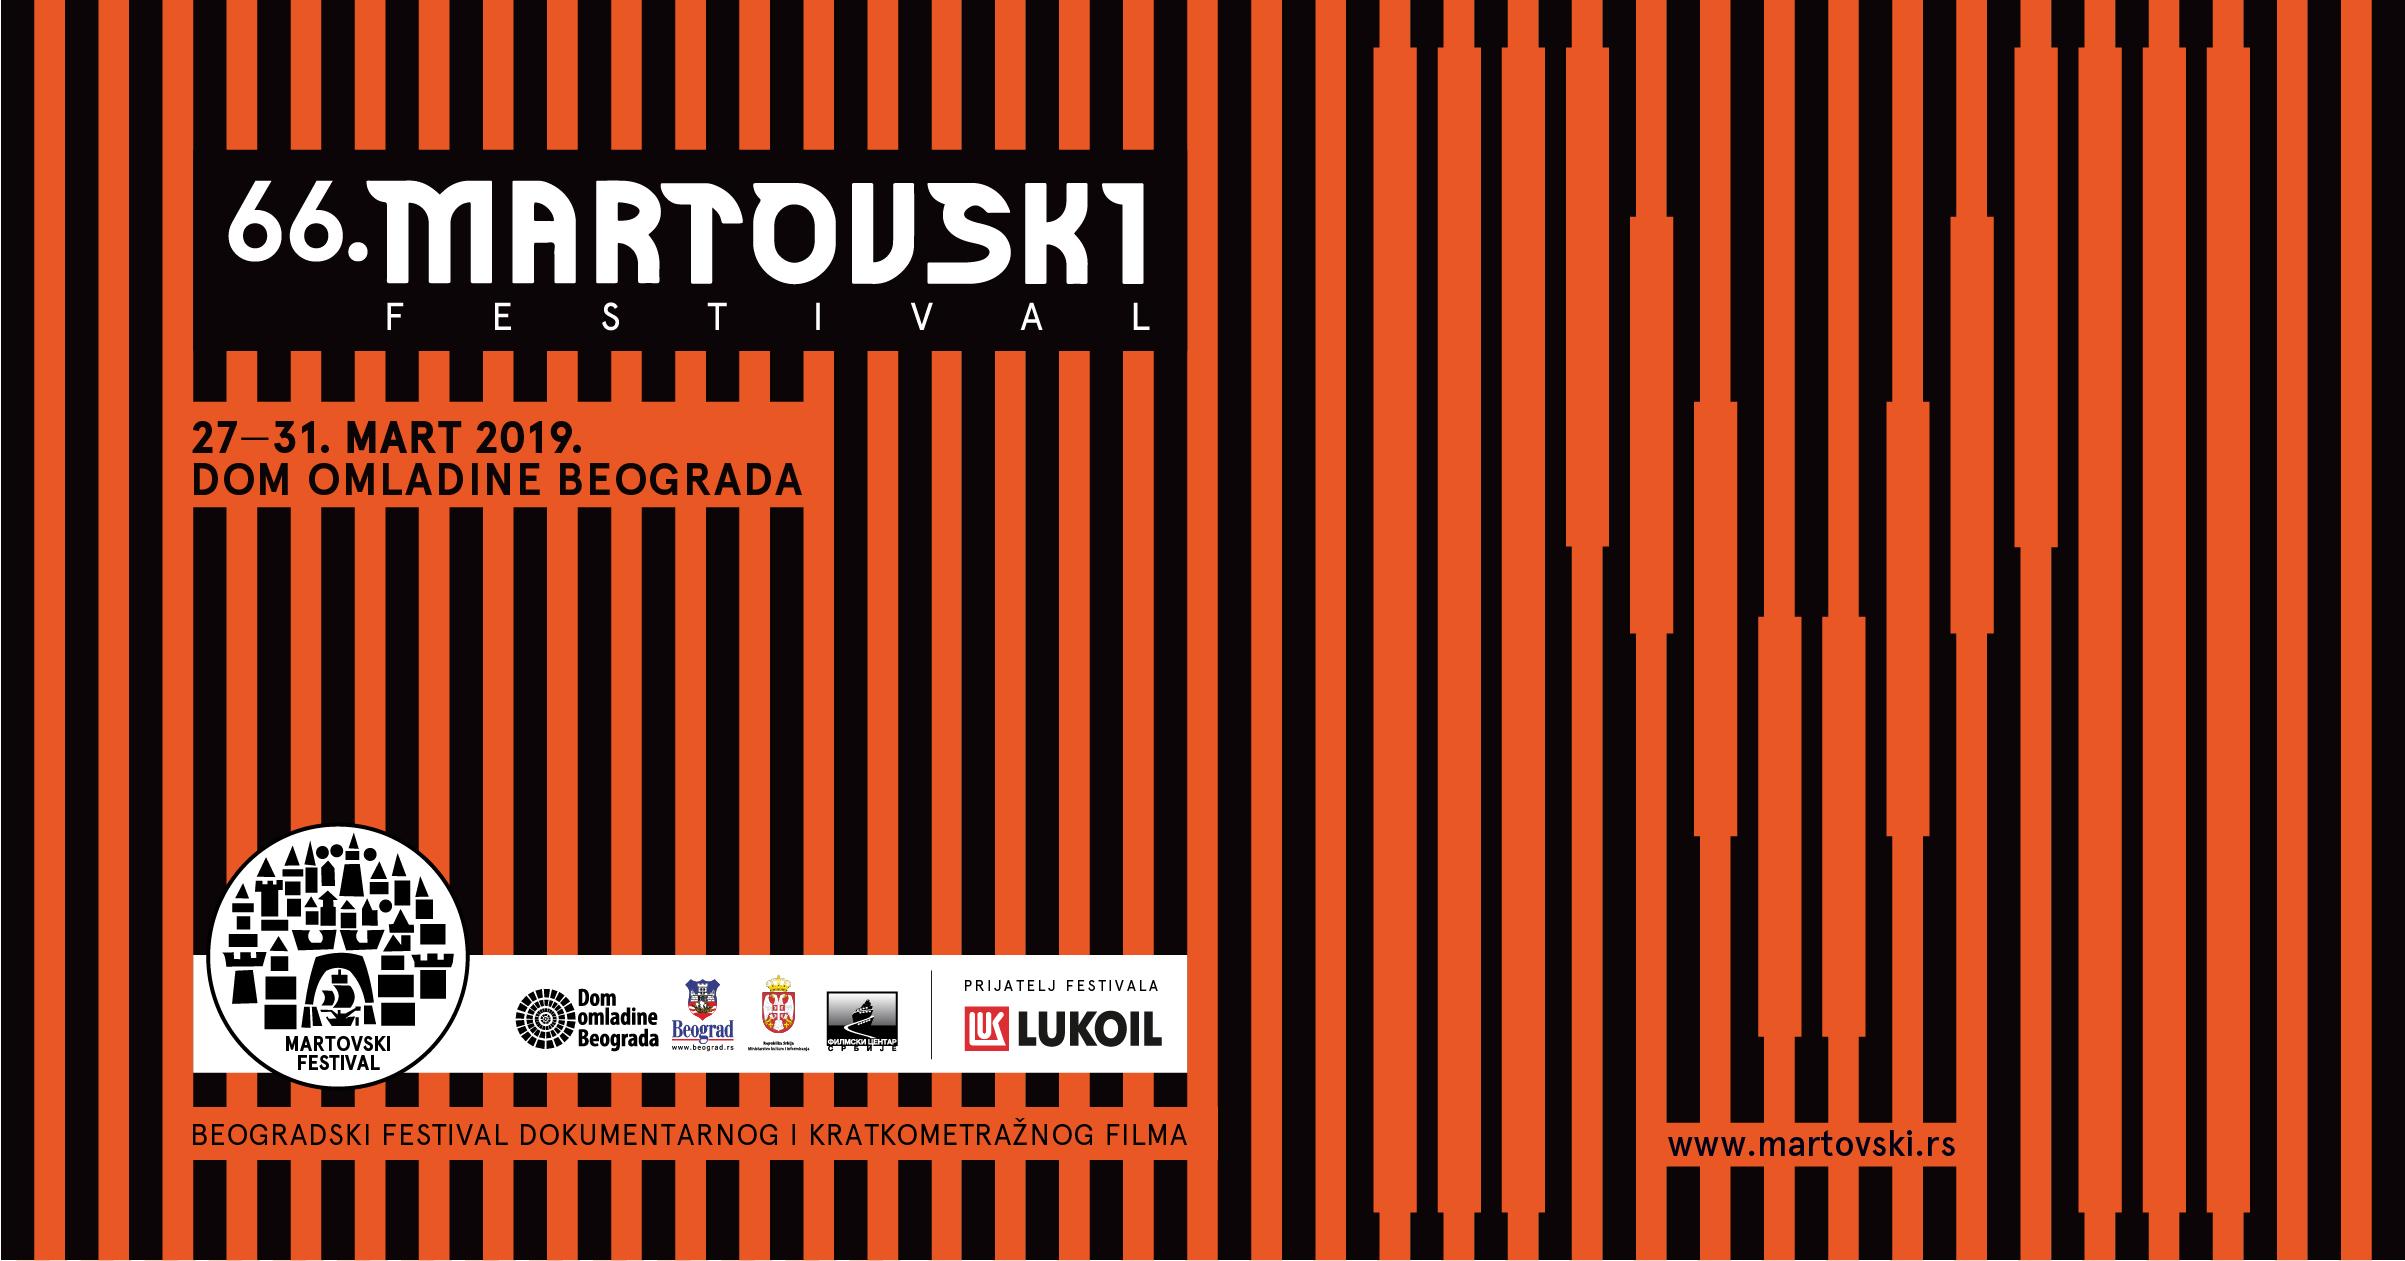 Martovski festival 2019